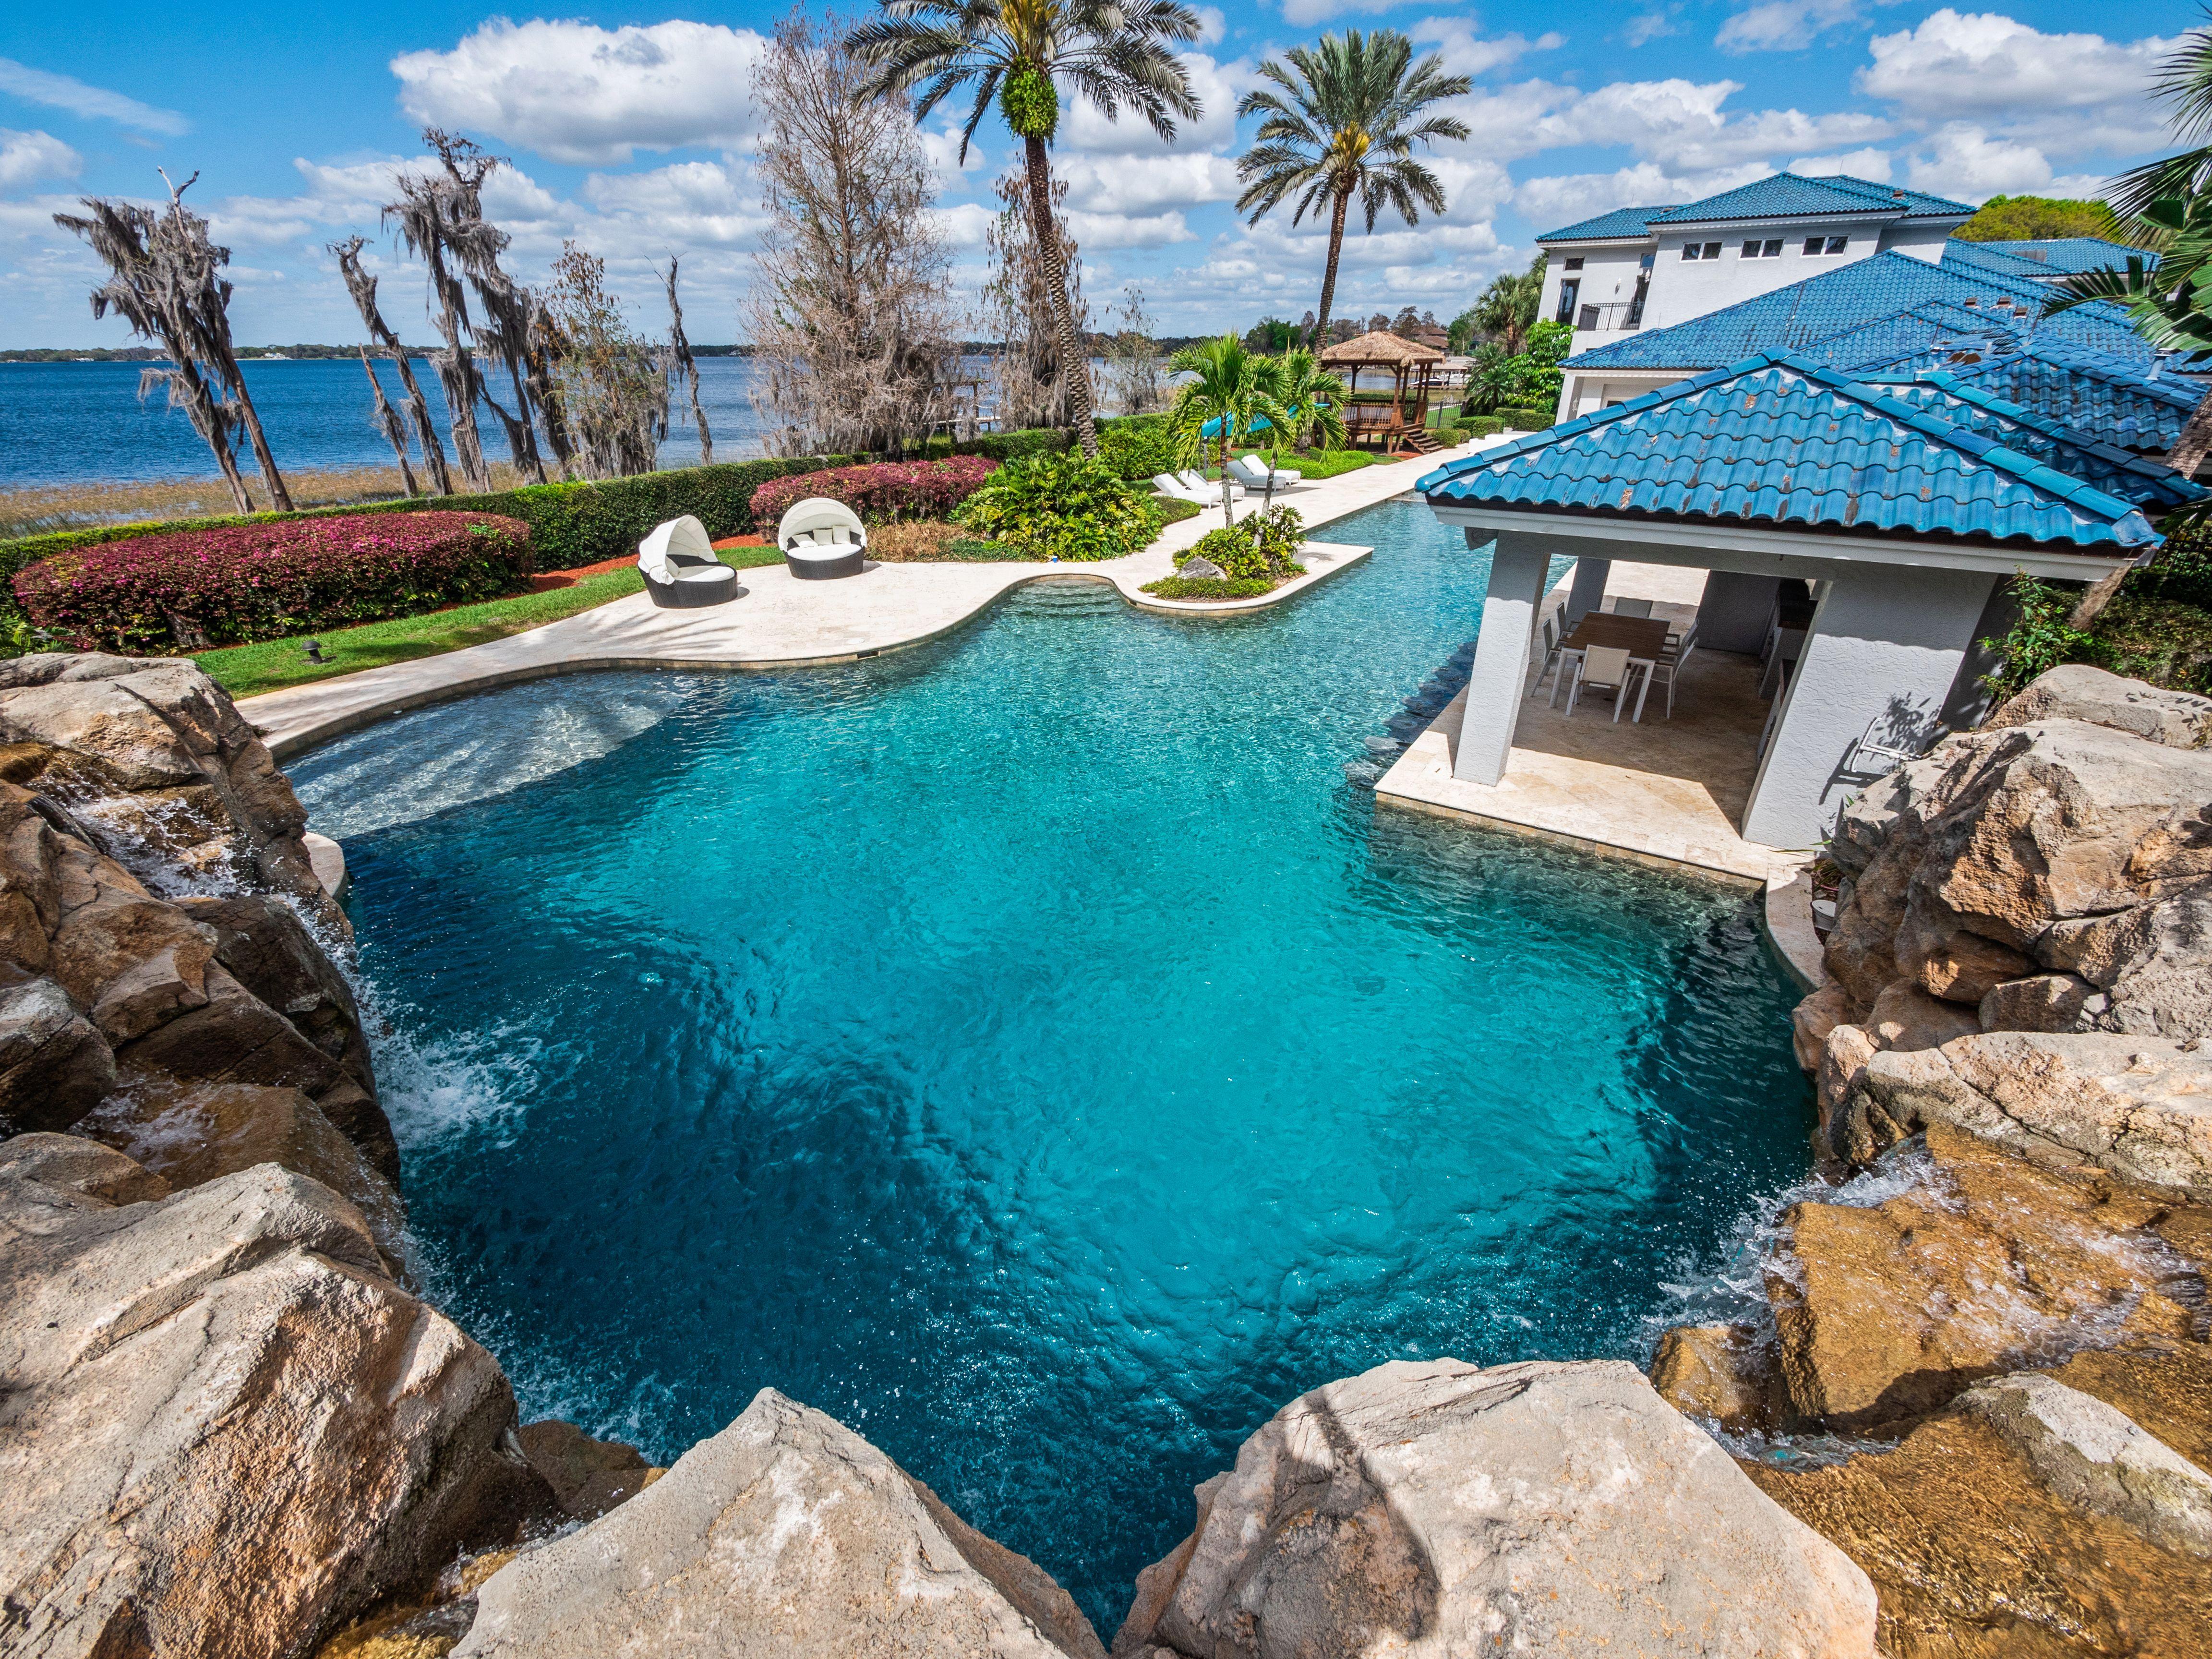 shaq's florida estate pool